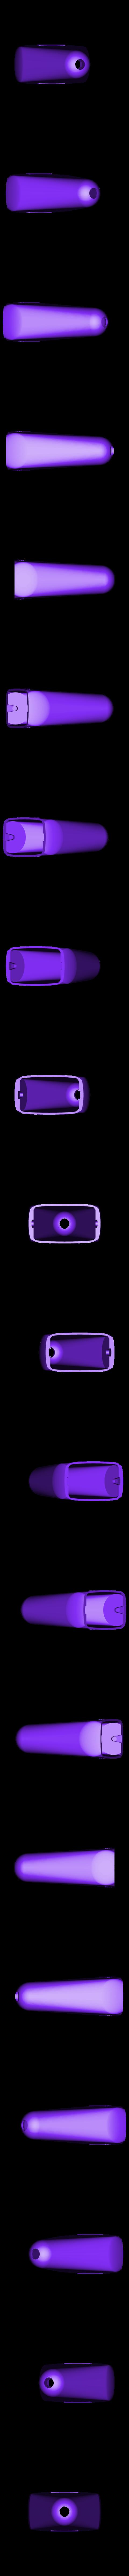 CaseV2_Vigorun_Y3-body.stl Download free STL file Customizable Case for Bluetooth Earbuds V2 • Design to 3D print, dede67